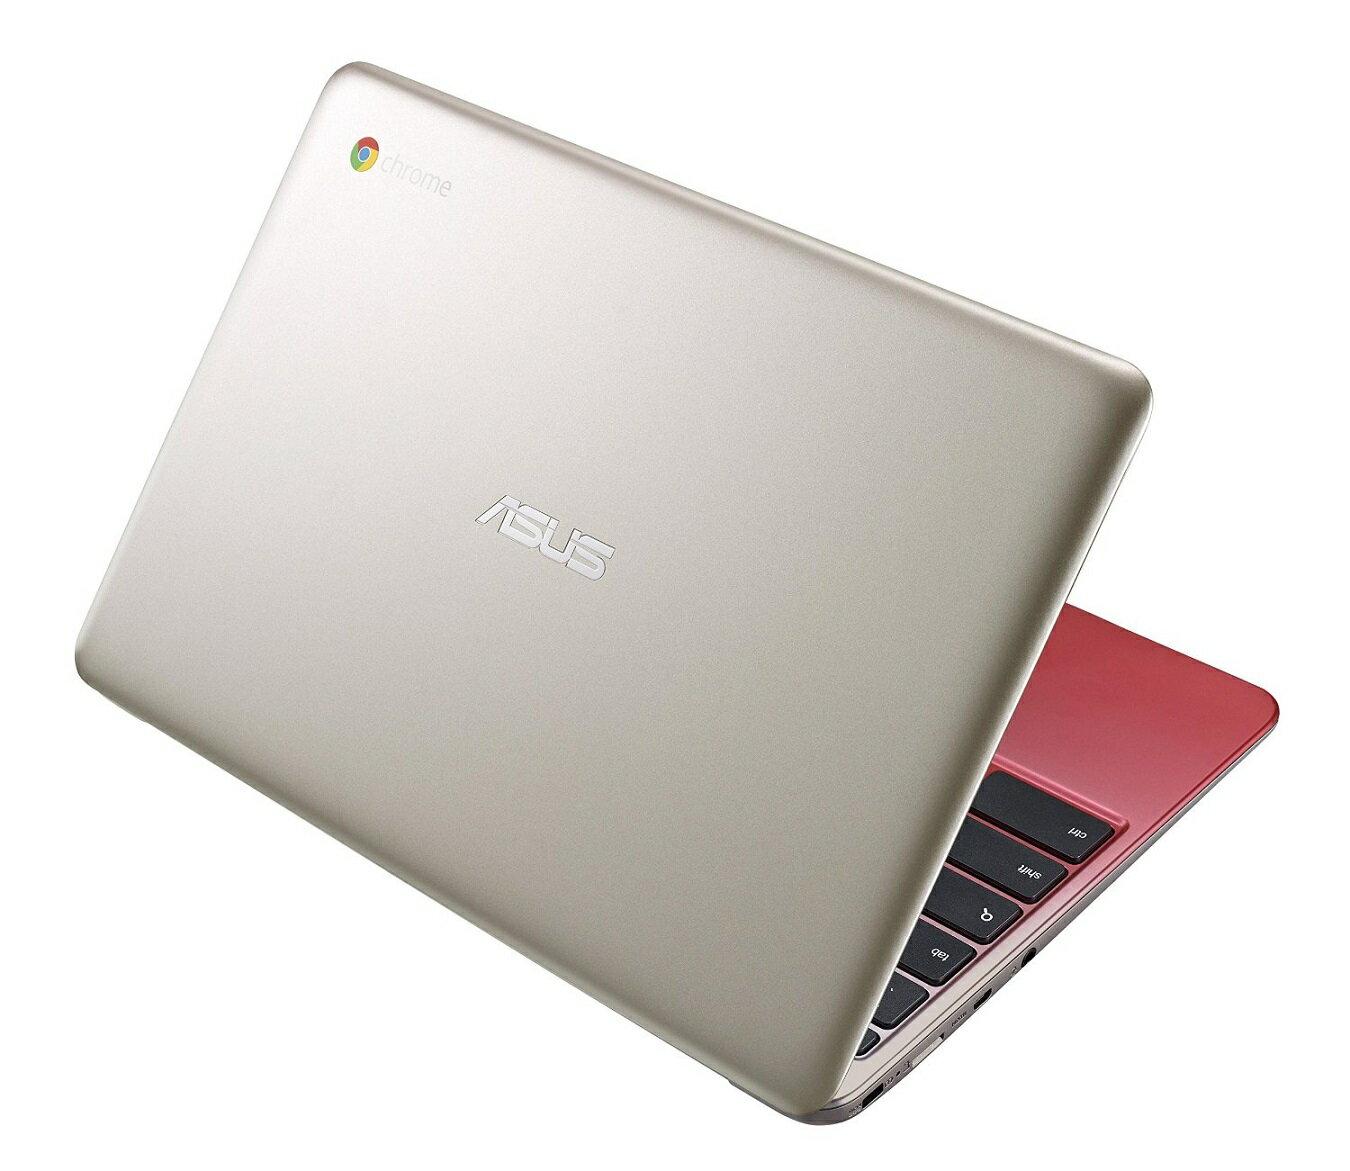 ASUS C201 11.6 Inch Chromebookゴールドレッド (Rockchip, 4GB, 16GB SSD, Gold/Red)並行輸入品